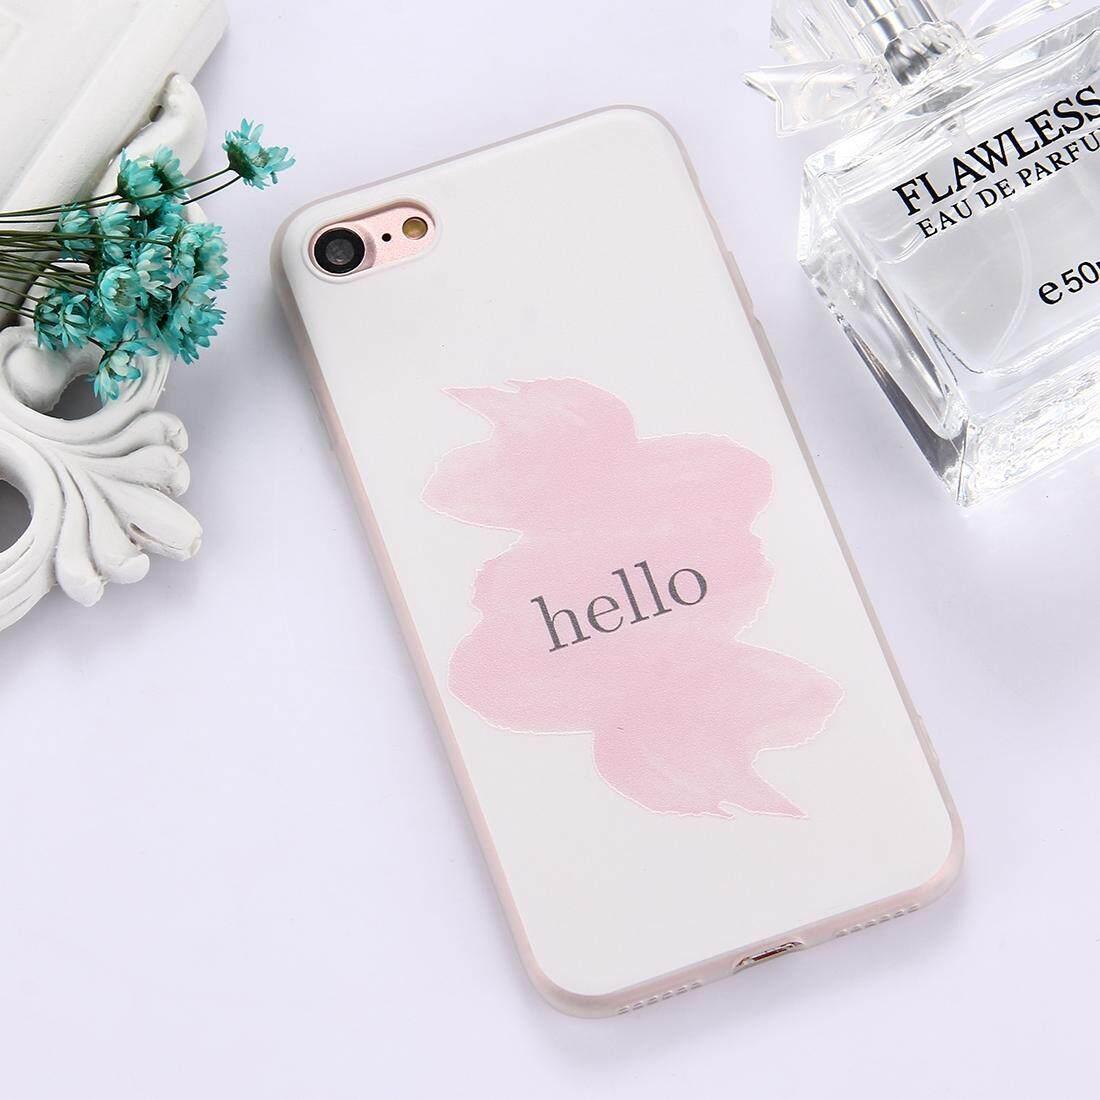 Untuk iPhone 8 & 7 Tpu Frosted Timbul Hello Kata Pola Pelindung Case Penutup Belakang-Intl